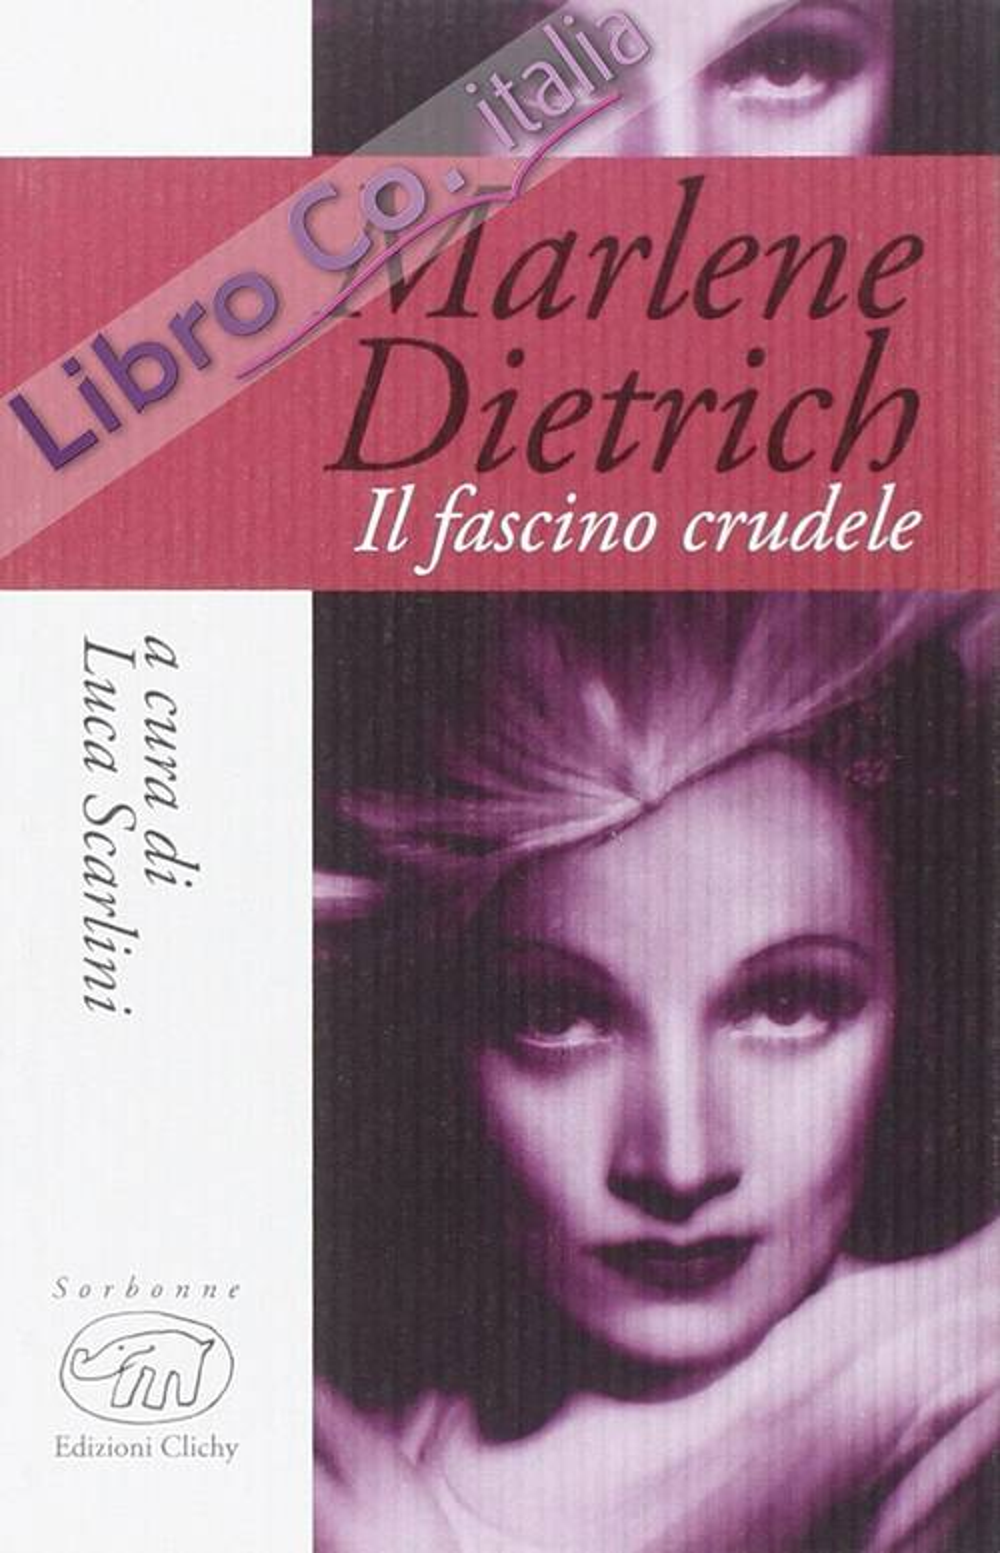 Marlene Dietrich. Il fascino crudele